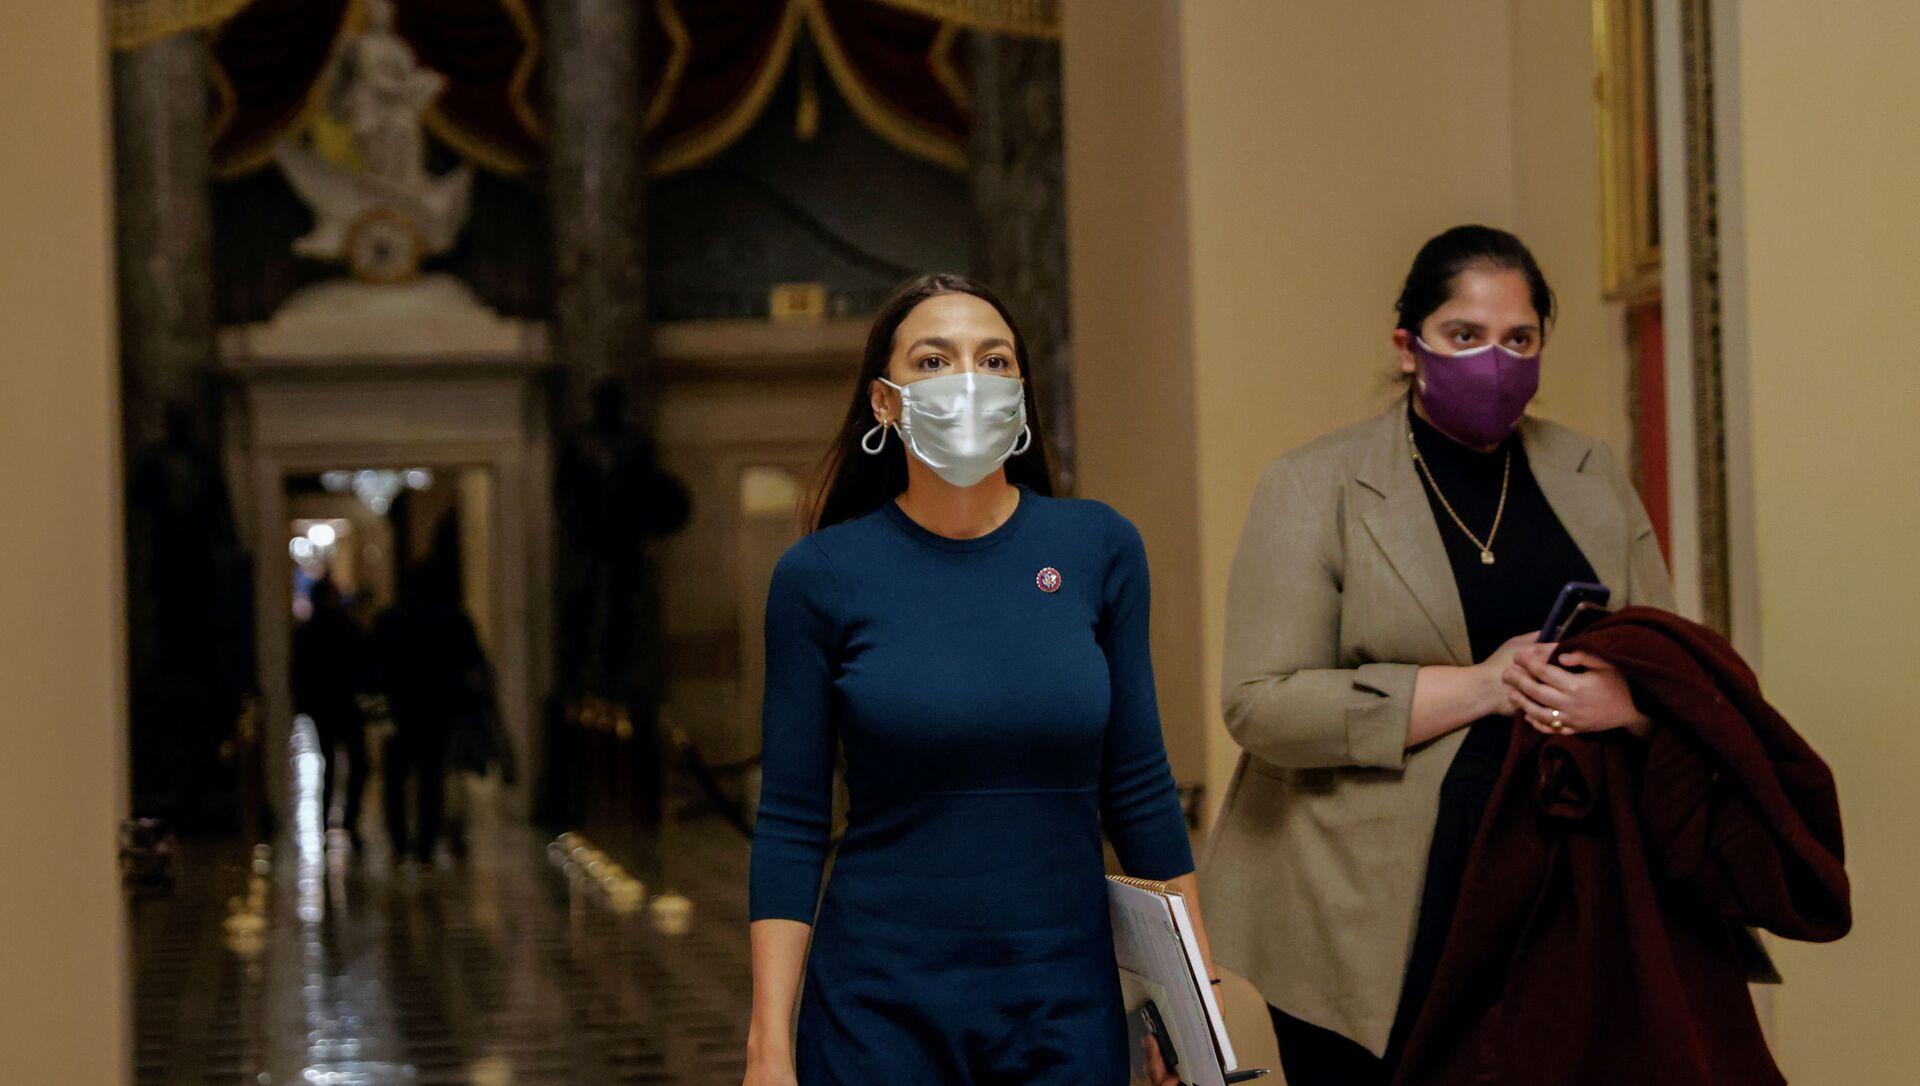 U.S. Rep. Alexandria Ocasio-Cortez (D-NY) walks through the U.S. Capitol - Sputnik International, 1920, 06.02.2021